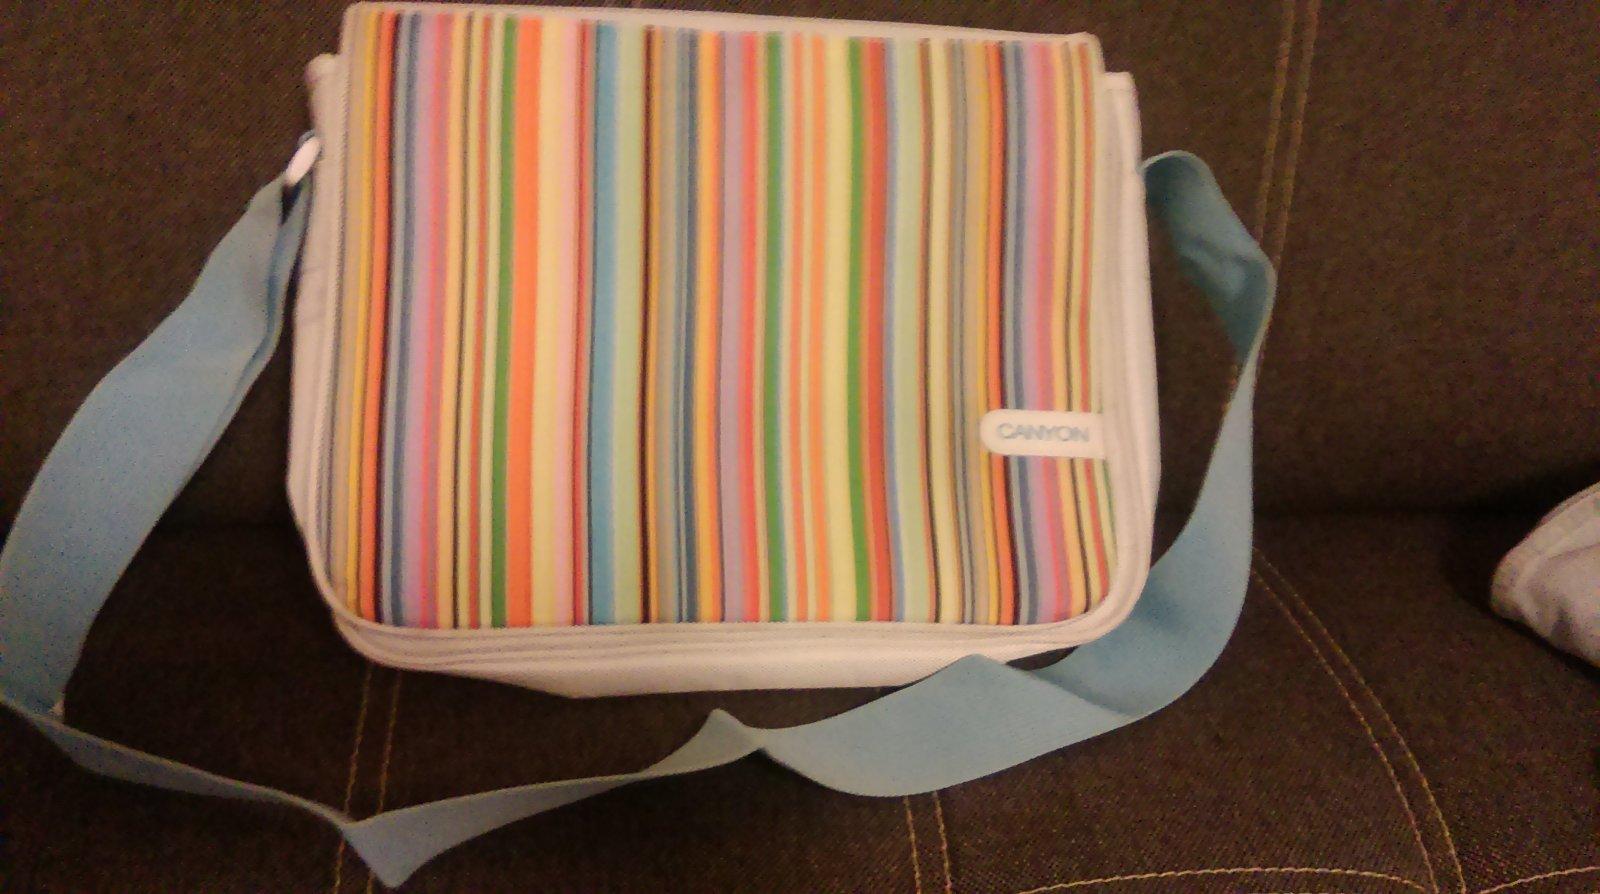 dc1f40961c Taška na notebook canyon stripes edition